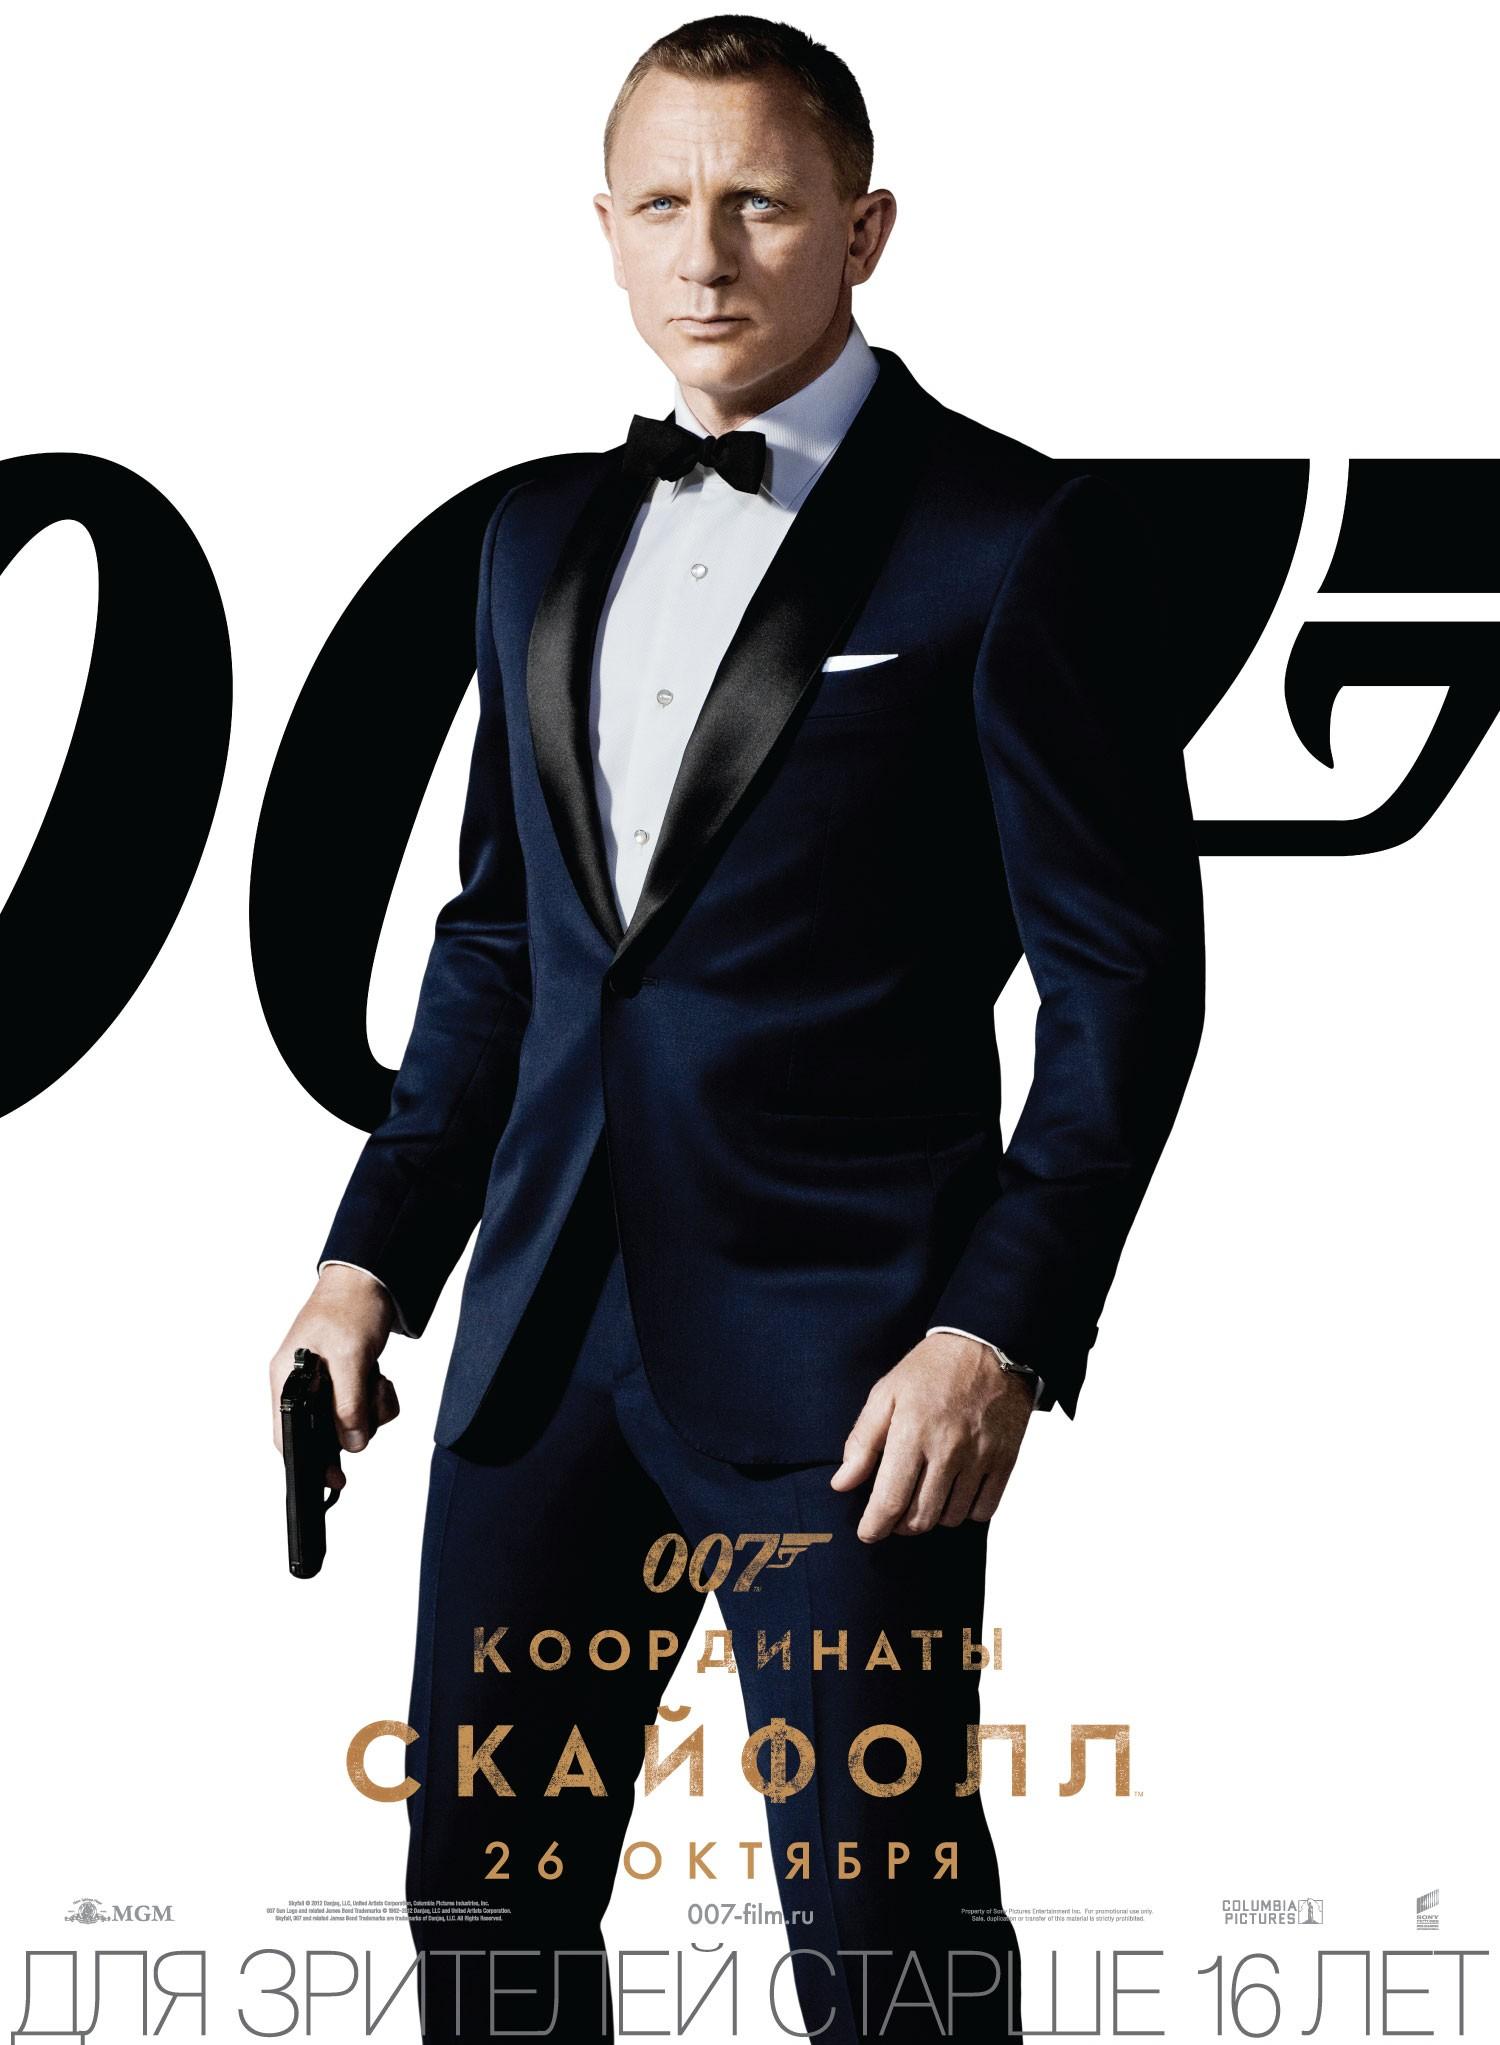 плакат фильма характер-постер локализованные 007 Координаты Скайфолл